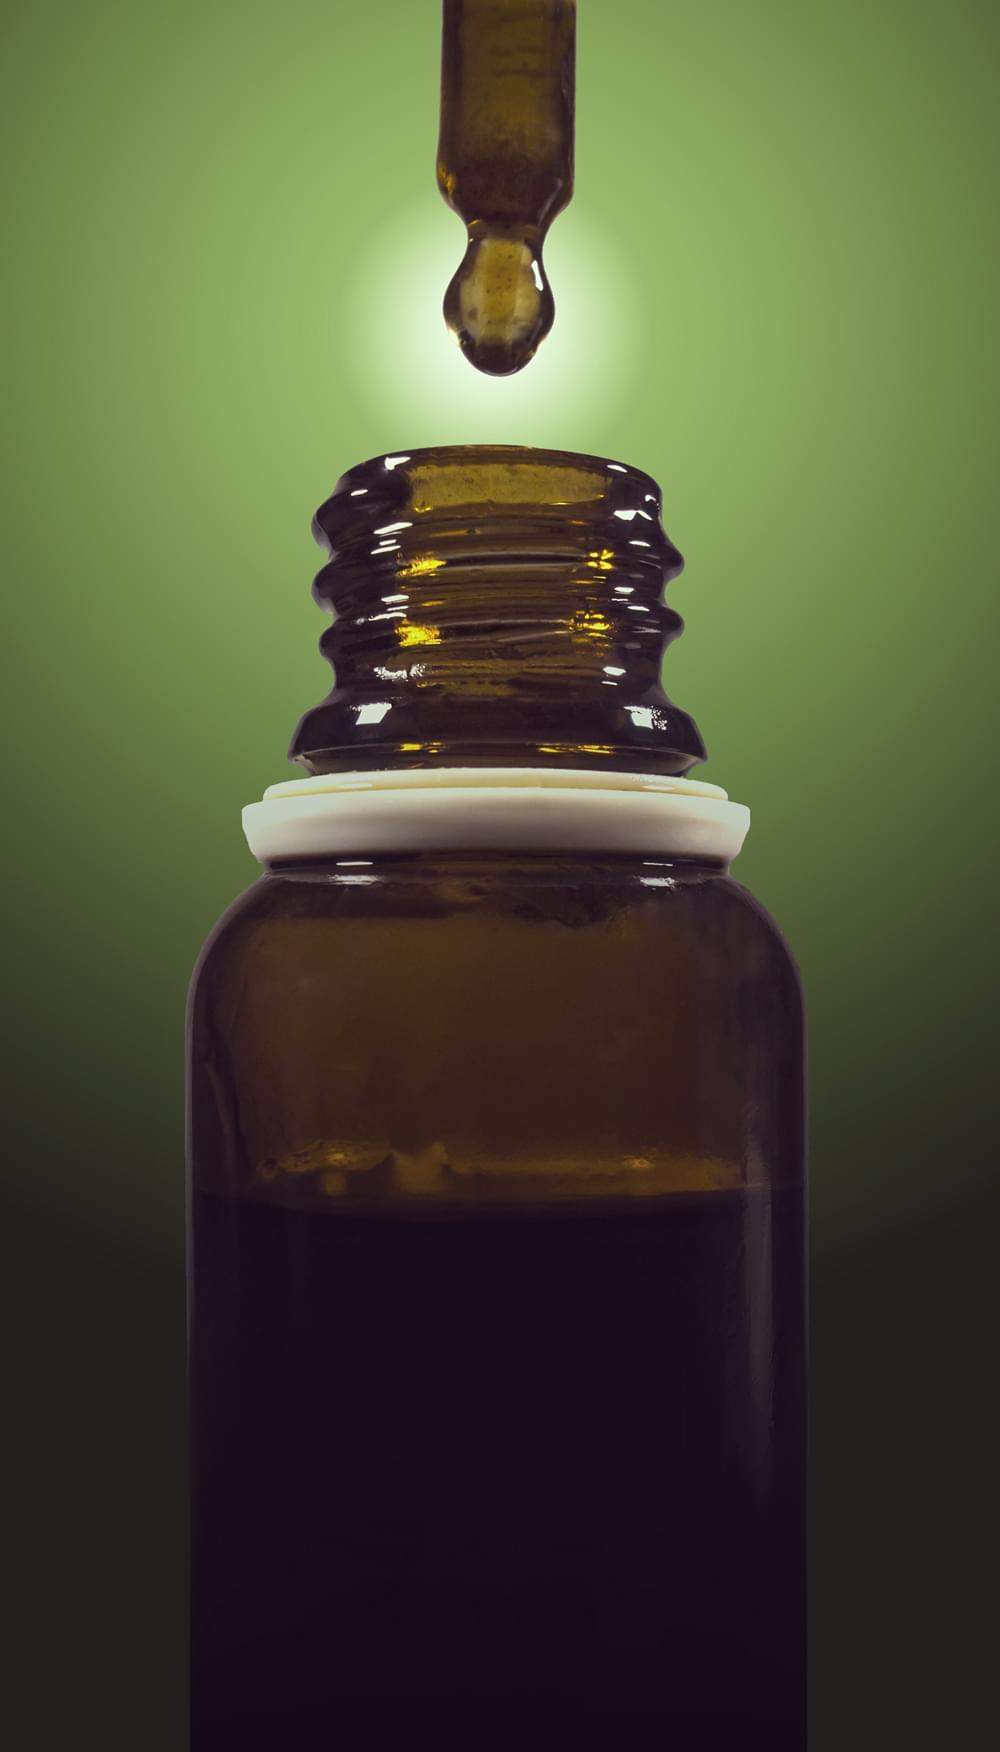 Cbd réglementation uk cannabis marijuana médicale